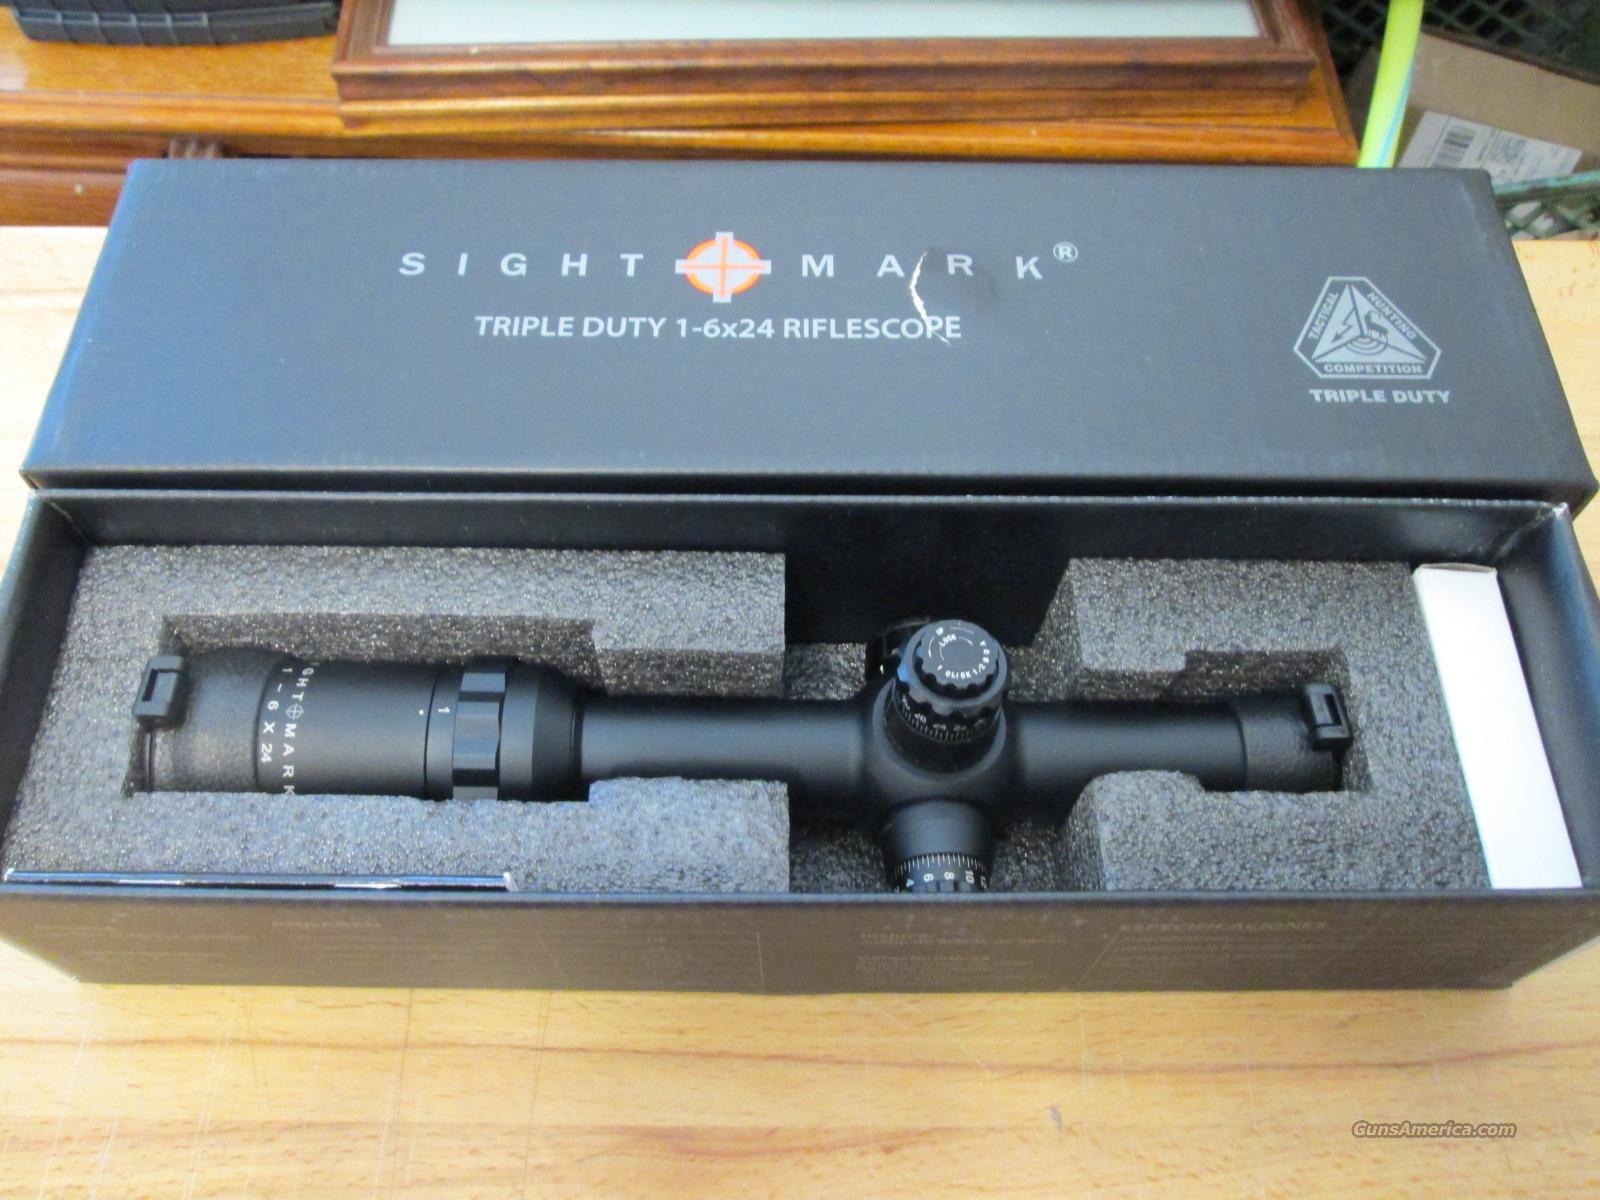 Sightmark Triple Duty CDX 1-6x24   Non-Guns > Scopes/Mounts/Rings & Optics > Rifle Scopes > Variable Focal Length